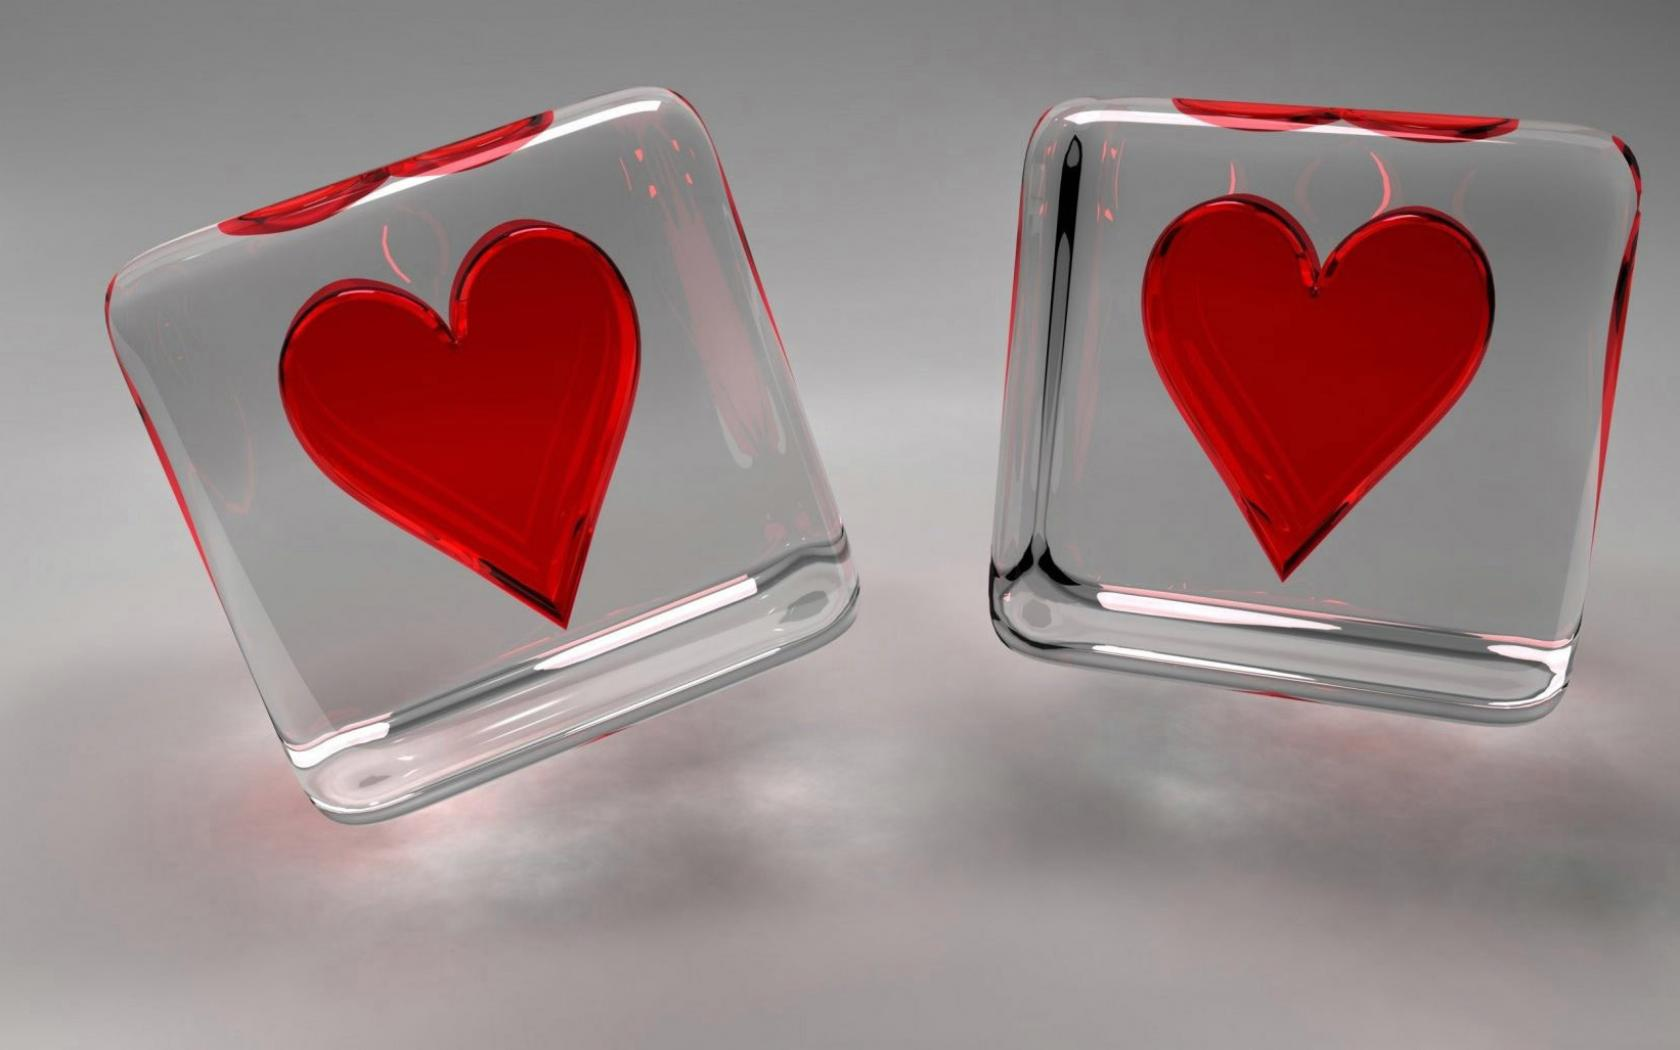 сердечки картинки на рабочий стол